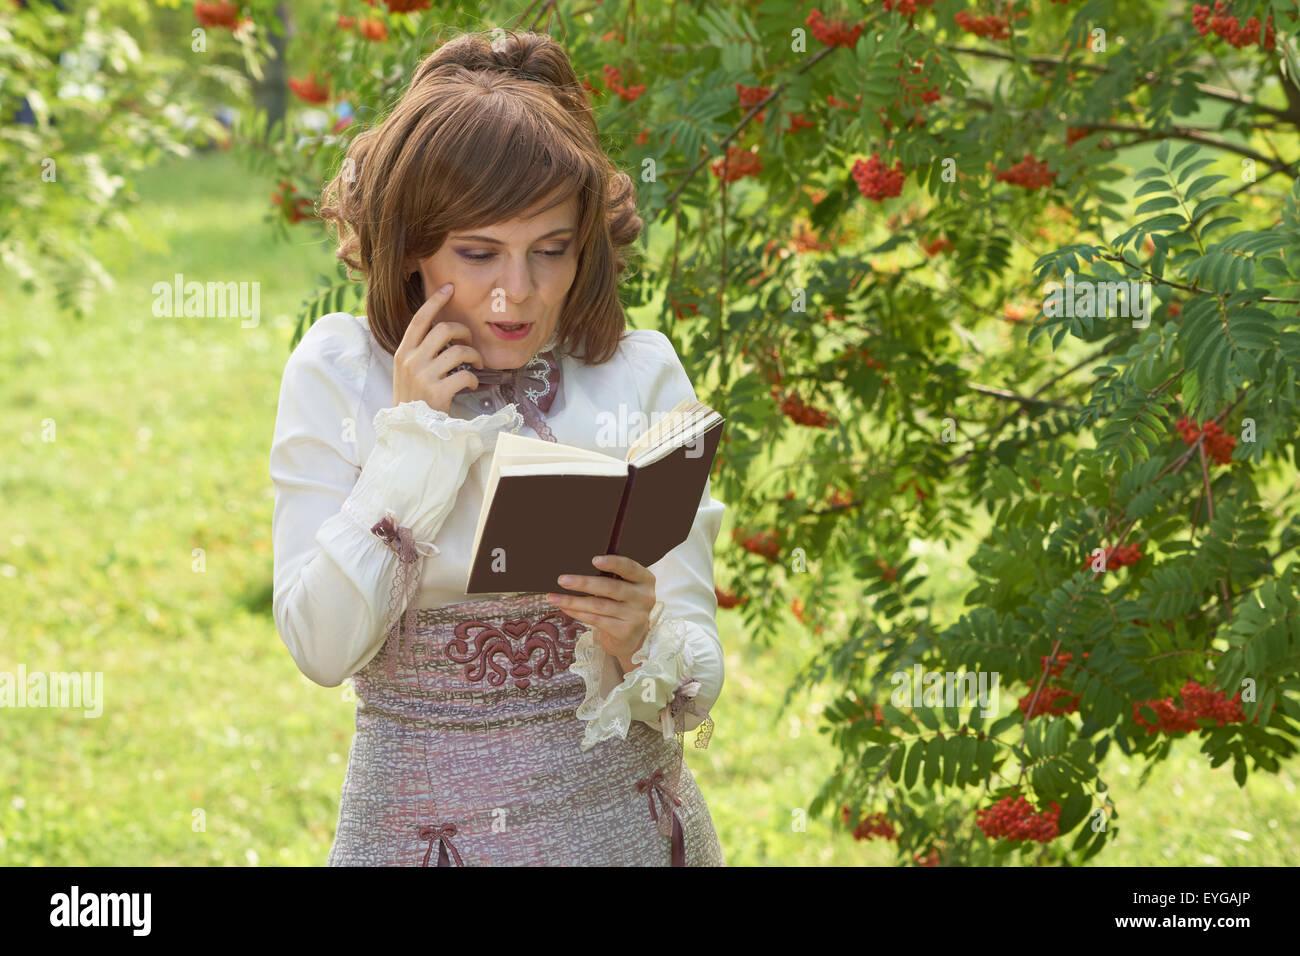 Smiling girl reads interesting book near rowan tree in summer - Stock Image